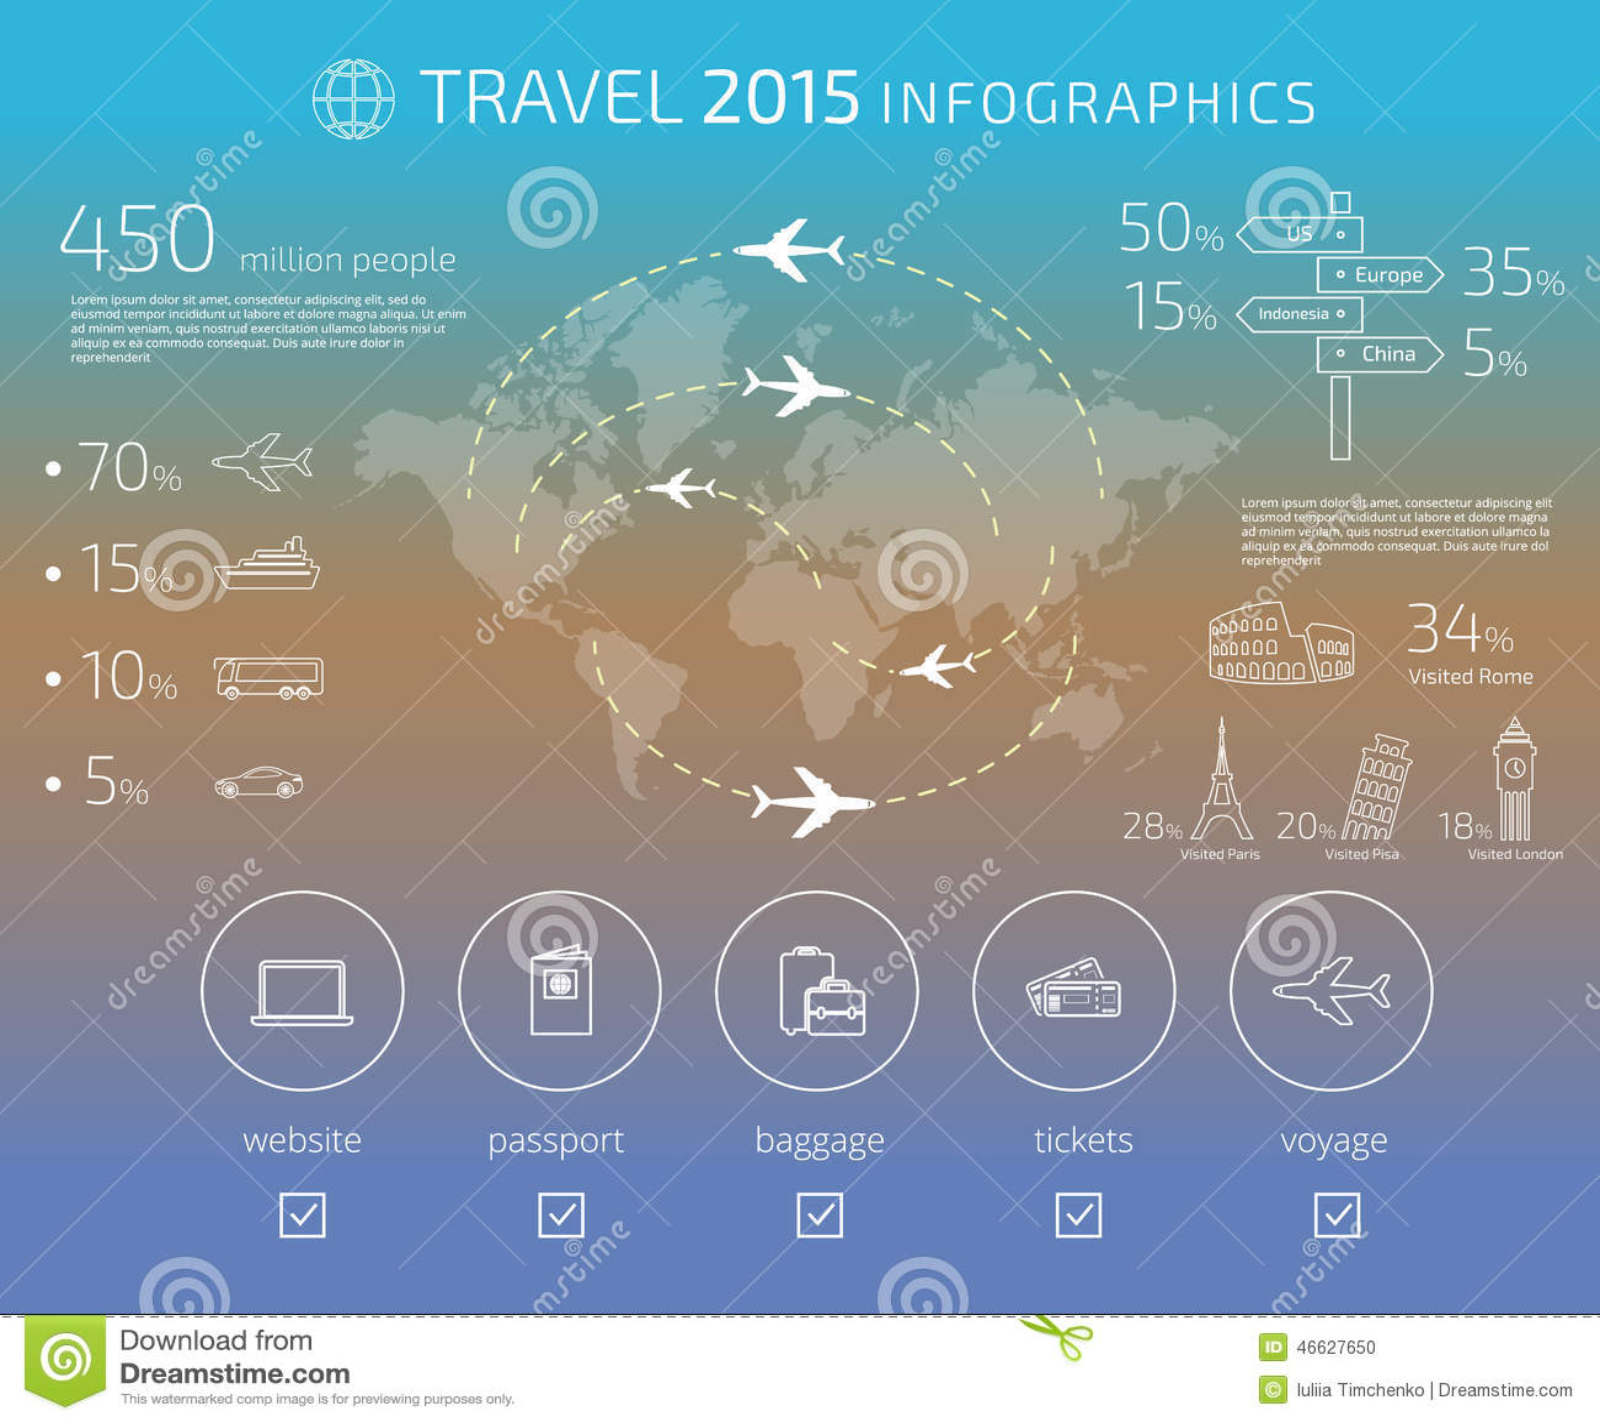 Voyage Infographic